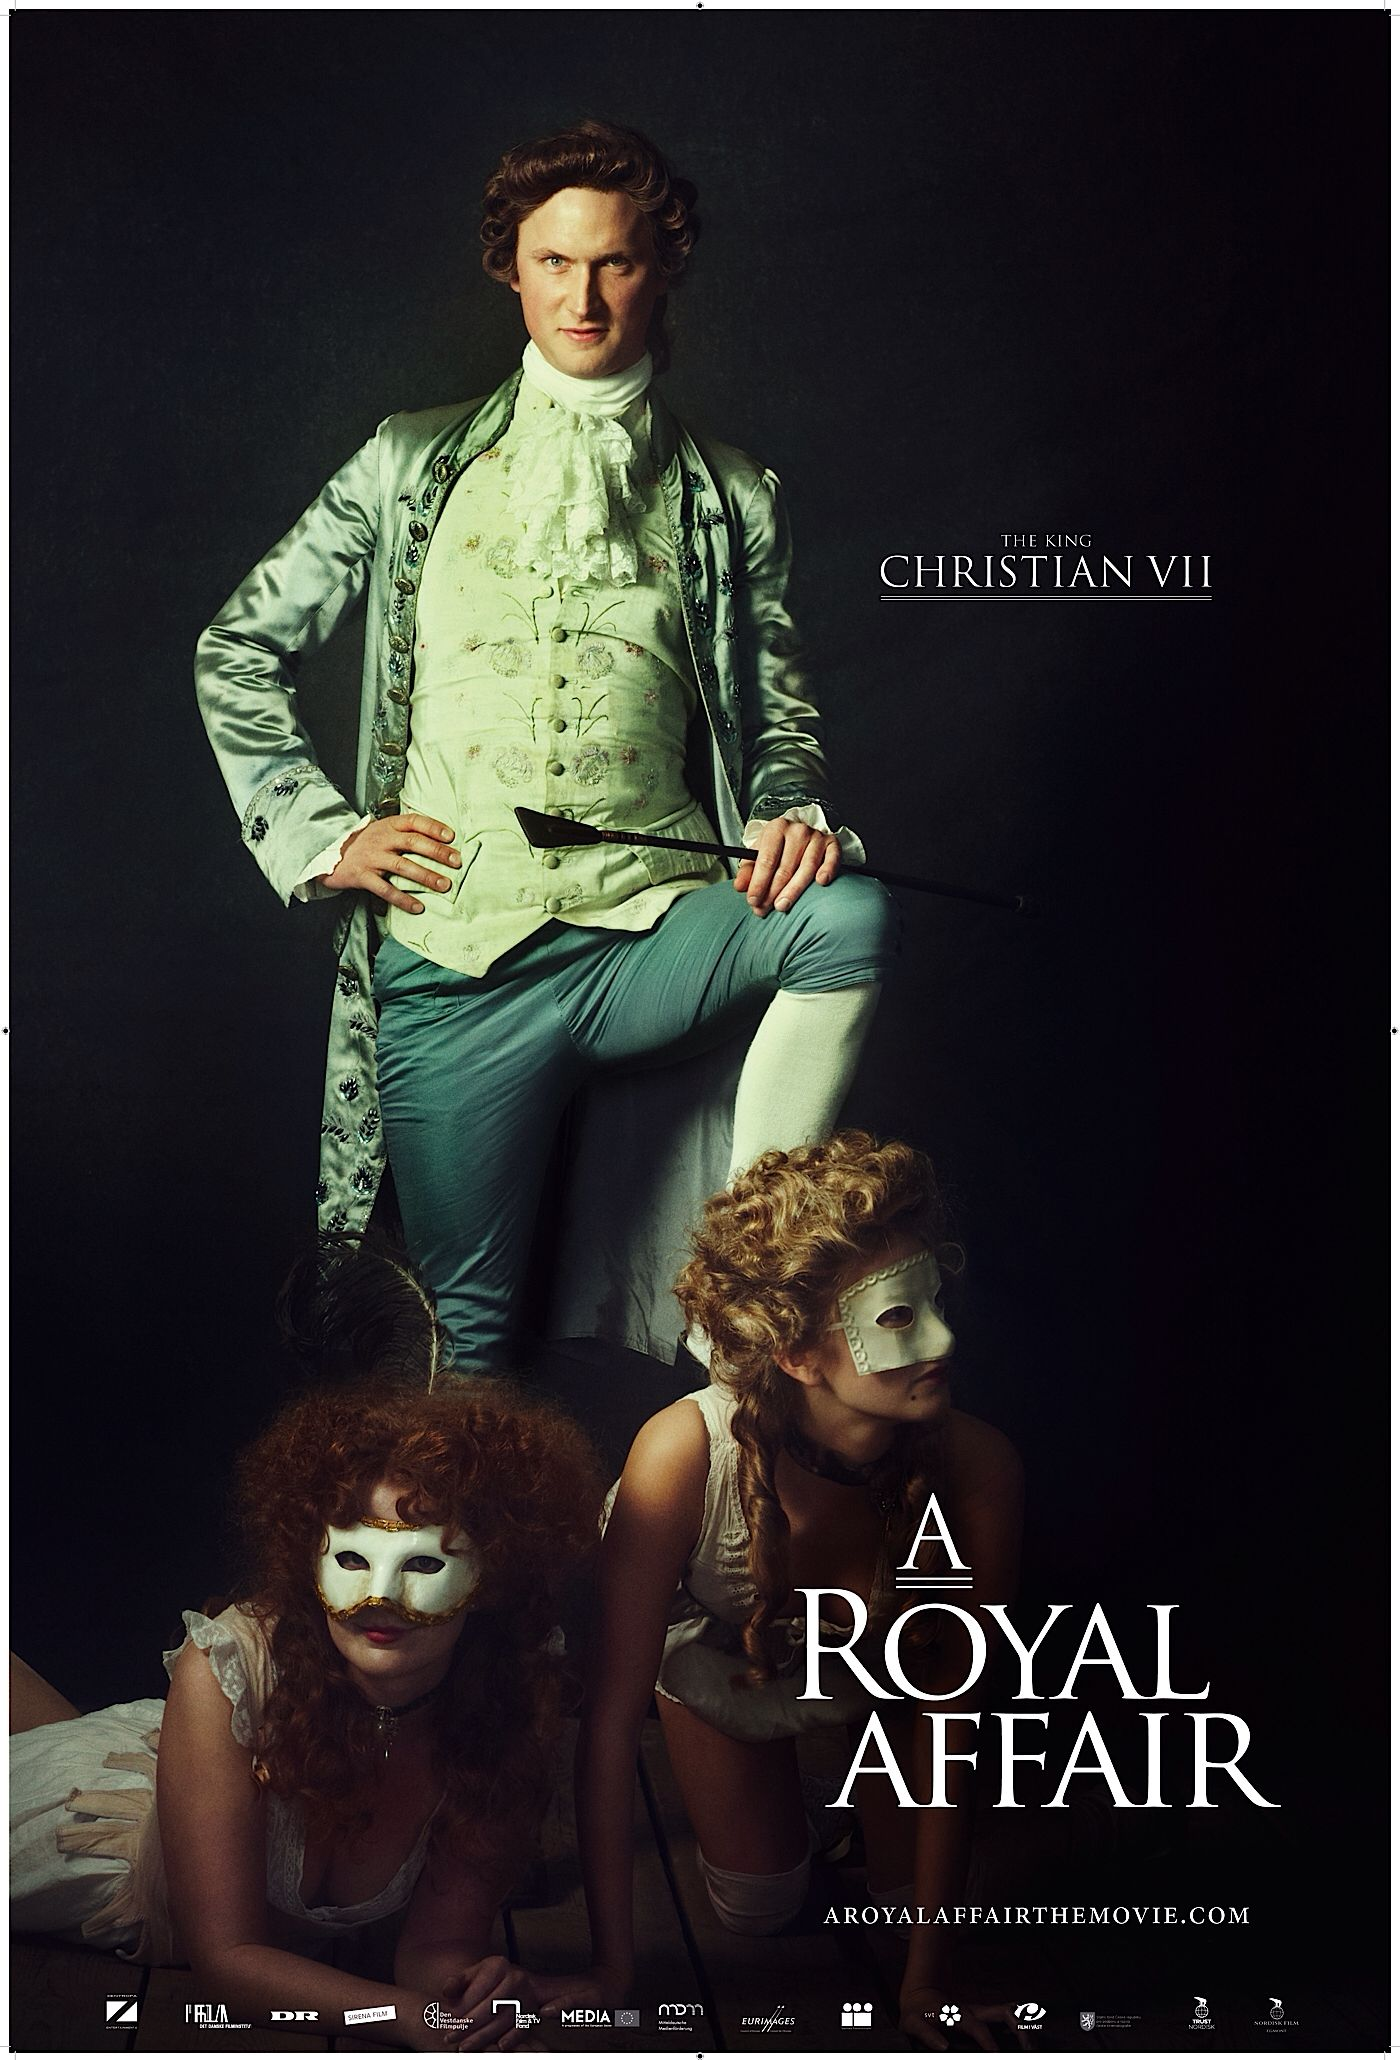 Mikkel Boe Følsgaard as Christian VII in A Royal Affair